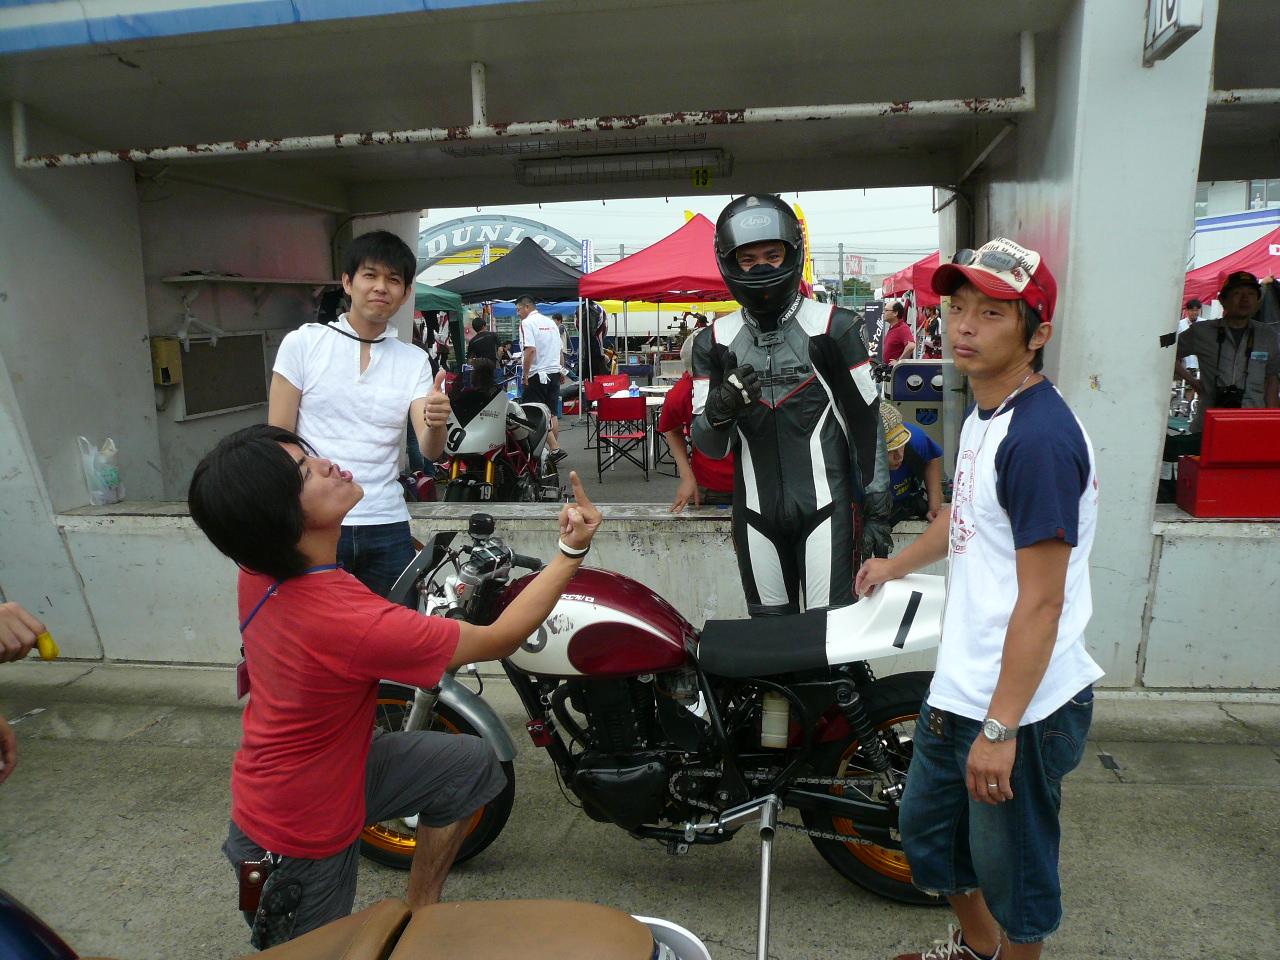 http://img.blogs.yahoo.co.jp/ybi/1/13/f5/tetsutaro499/folder/420377/img_420377_48531523_5?1246460044